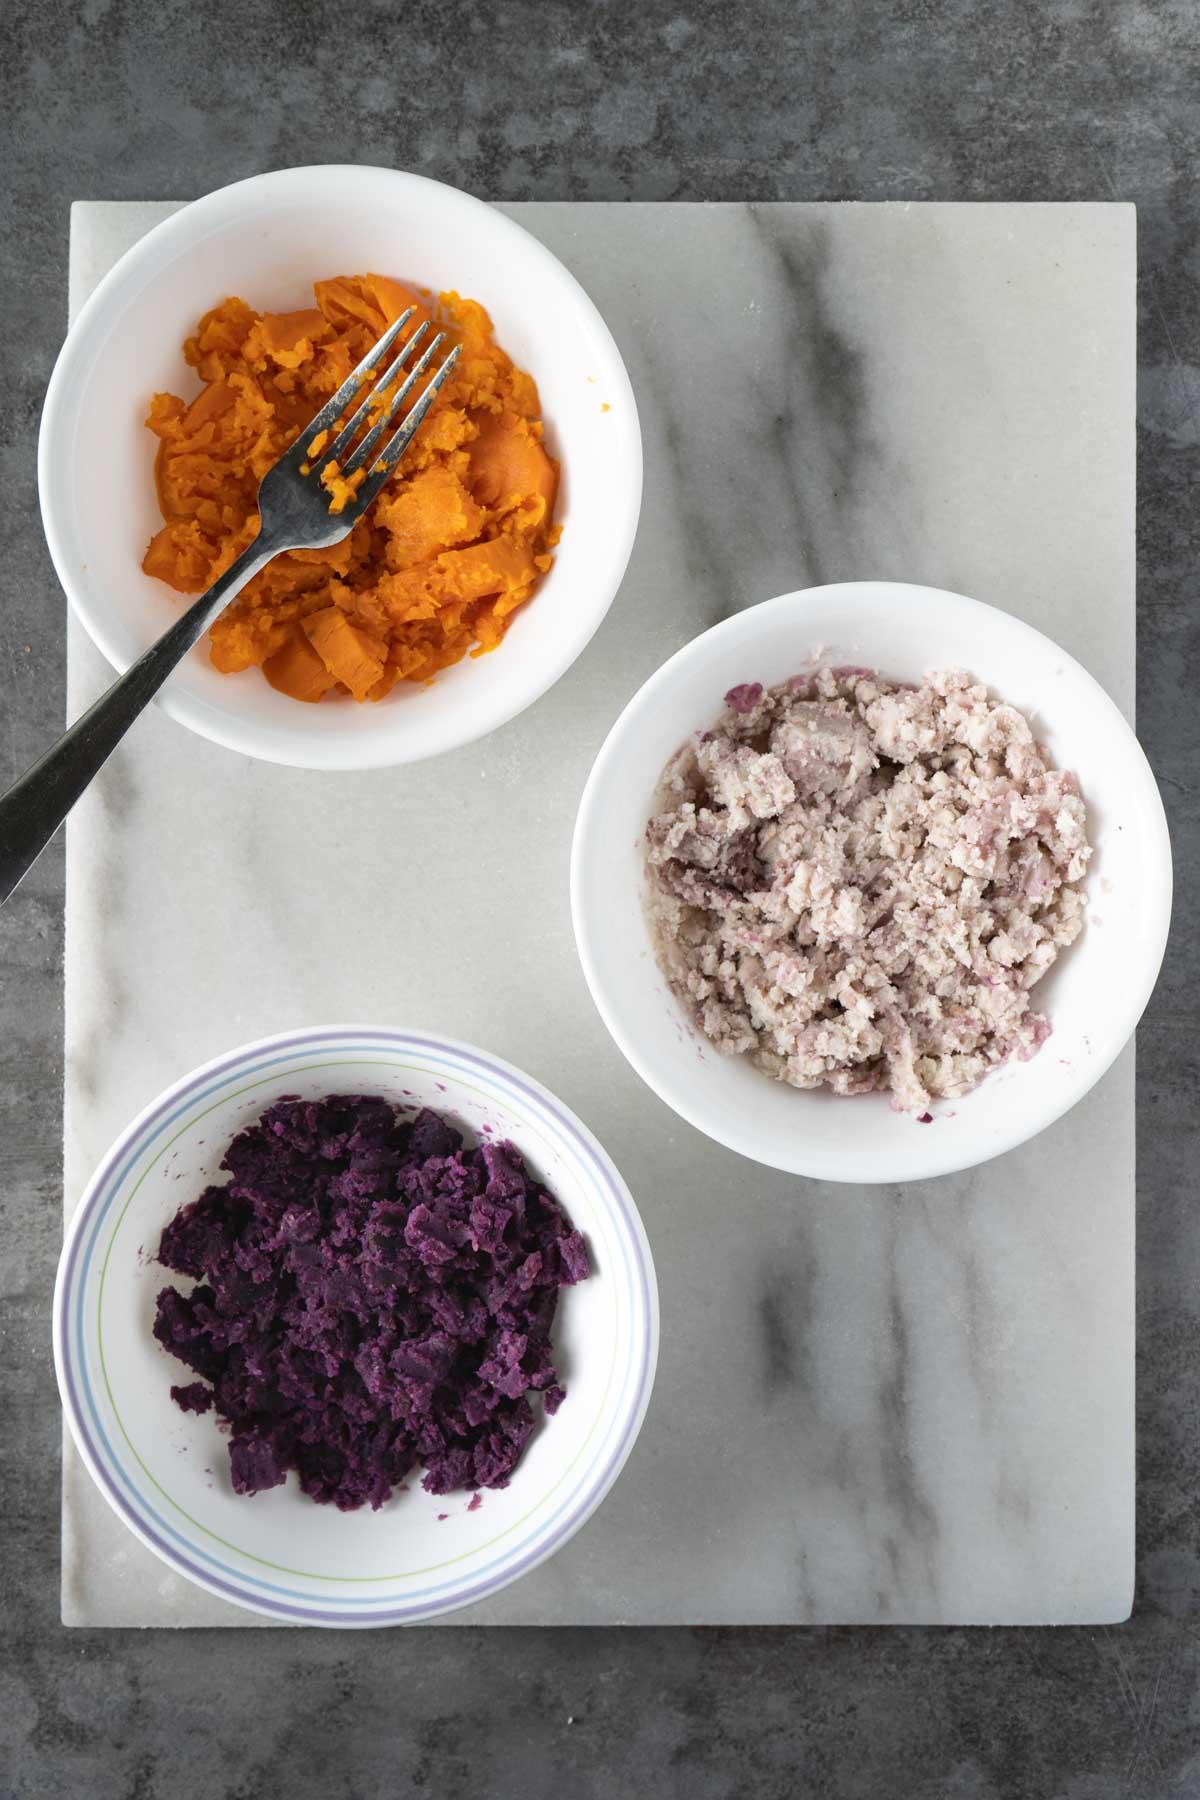 Mashed sweet potato, taro and purple sweet potato.